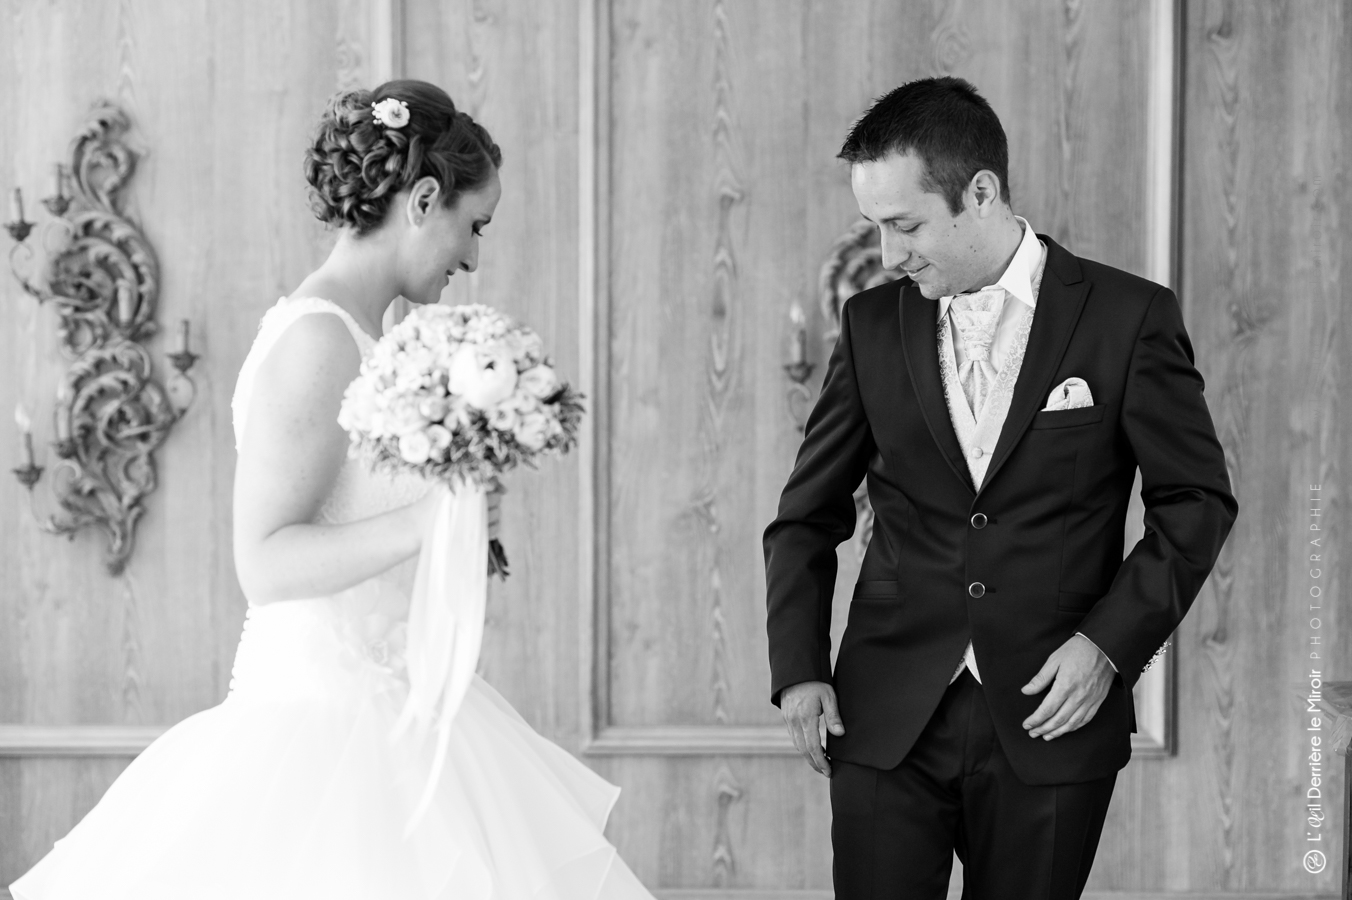 mariage-cj-vaugrenier-loeilderrierelemiroir-024